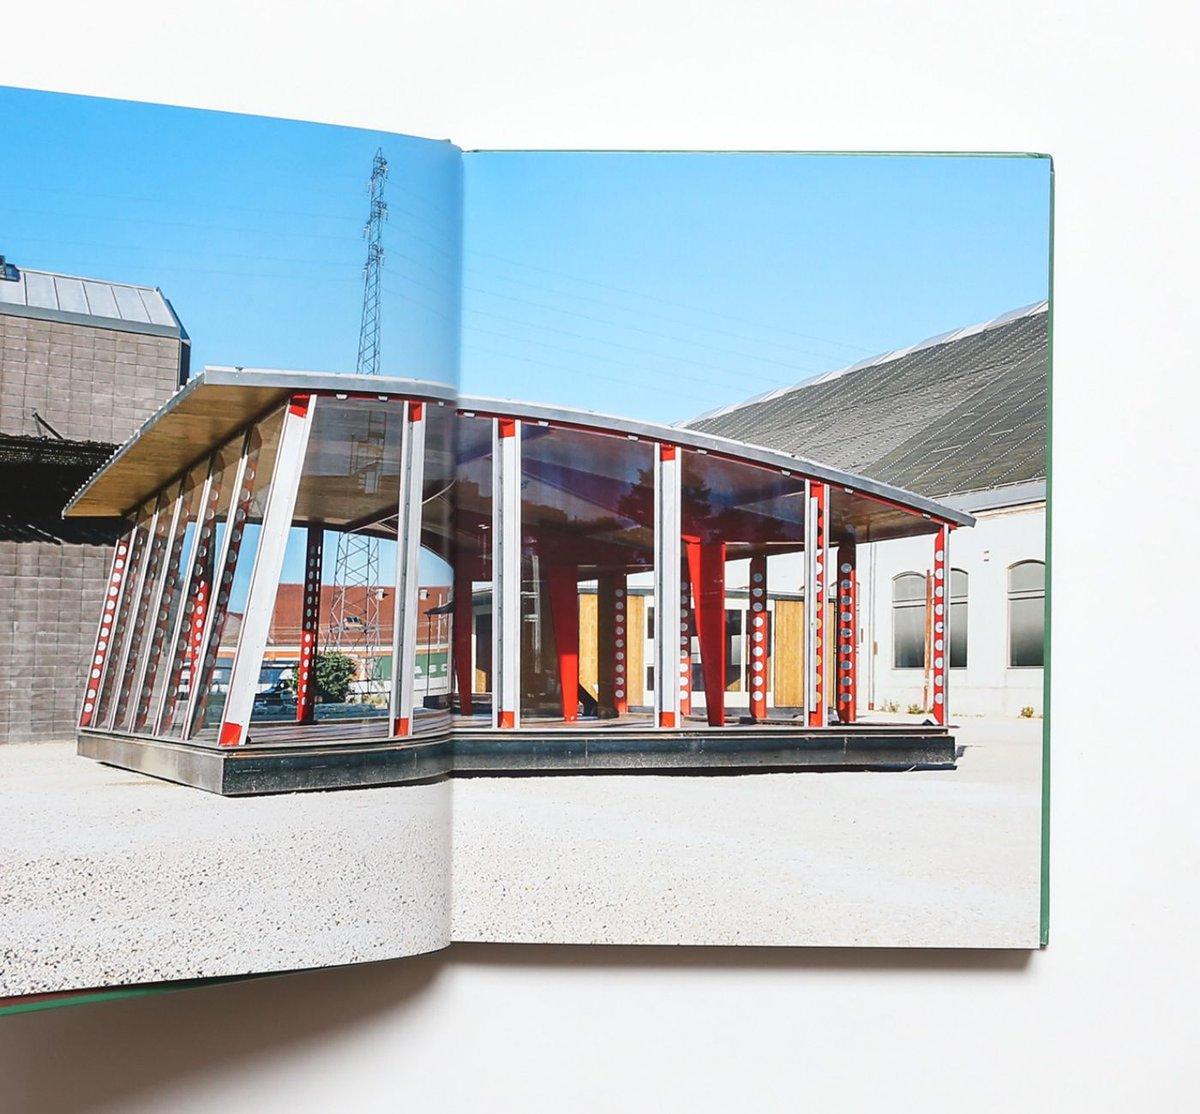 test ツイッターメディア - 【Jean Prouve: Architect for Better Days】  フランスの建築家、ジャン・プルーヴェのプレハブ住宅を特集した作品集。  完成作品に加え、図面や手書きのメモ、制作過程を記録した写真など、豊富な図版をカラーとモノクロで掲載。 https://t.co/5Dk6u0teG6 https://t.co/OMQod42eWa